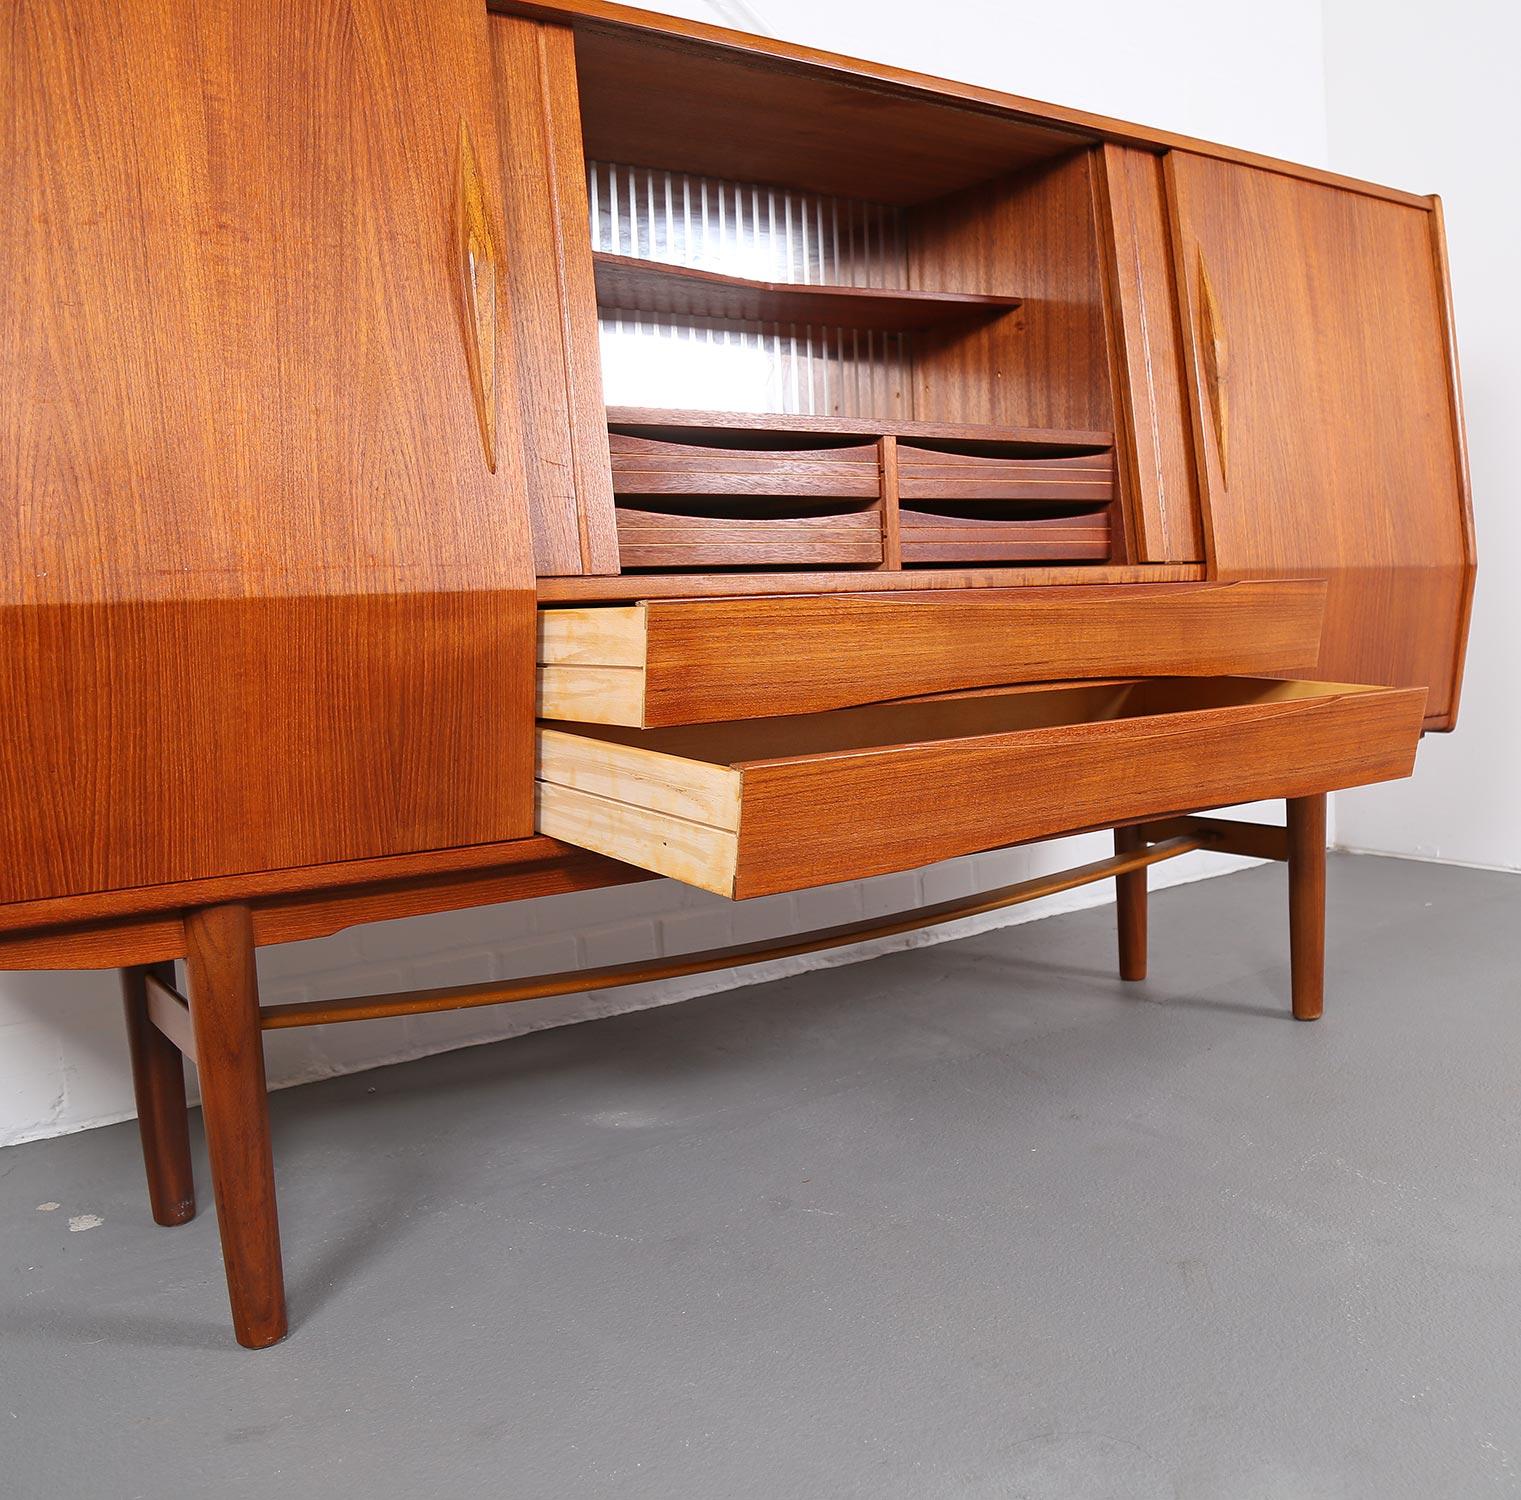 geometric danish design teak sideboard credenza dekaden. Black Bedroom Furniture Sets. Home Design Ideas